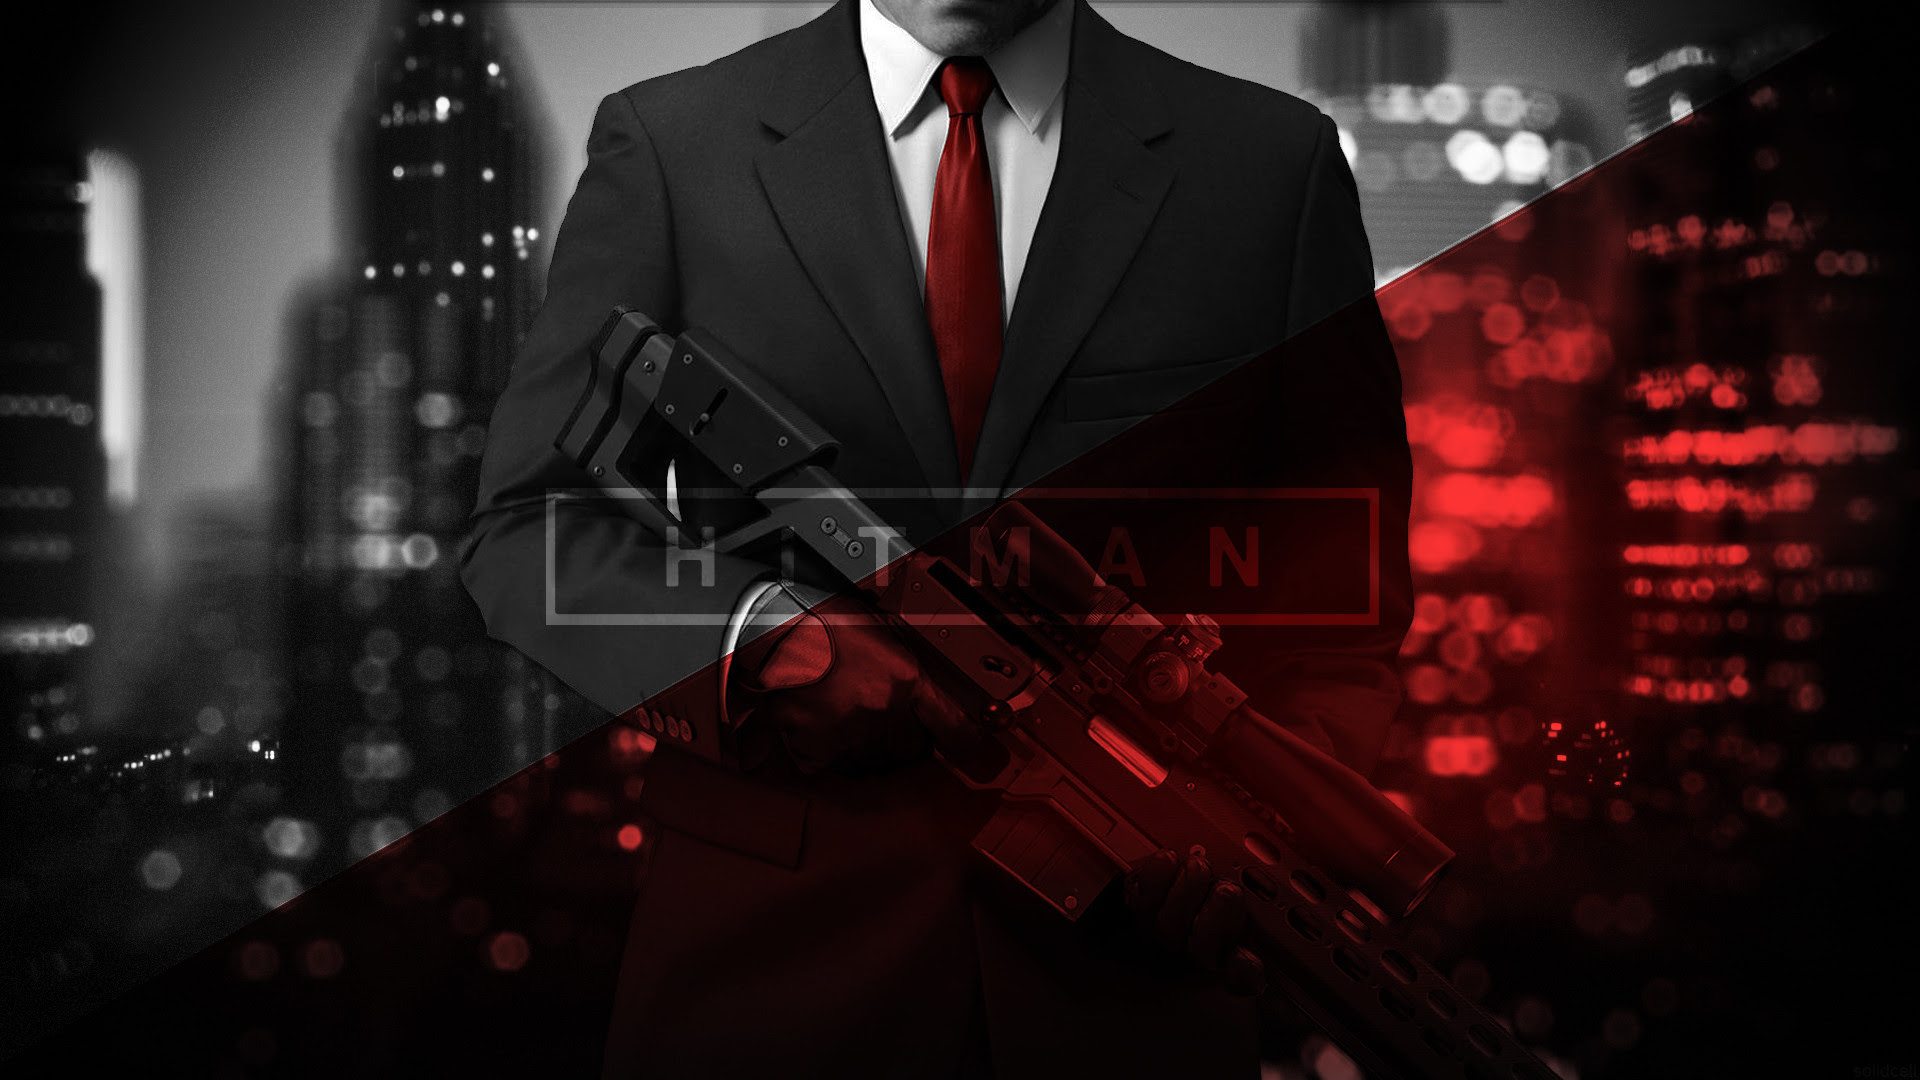 Hitman Wallpaper HD (69+ images)